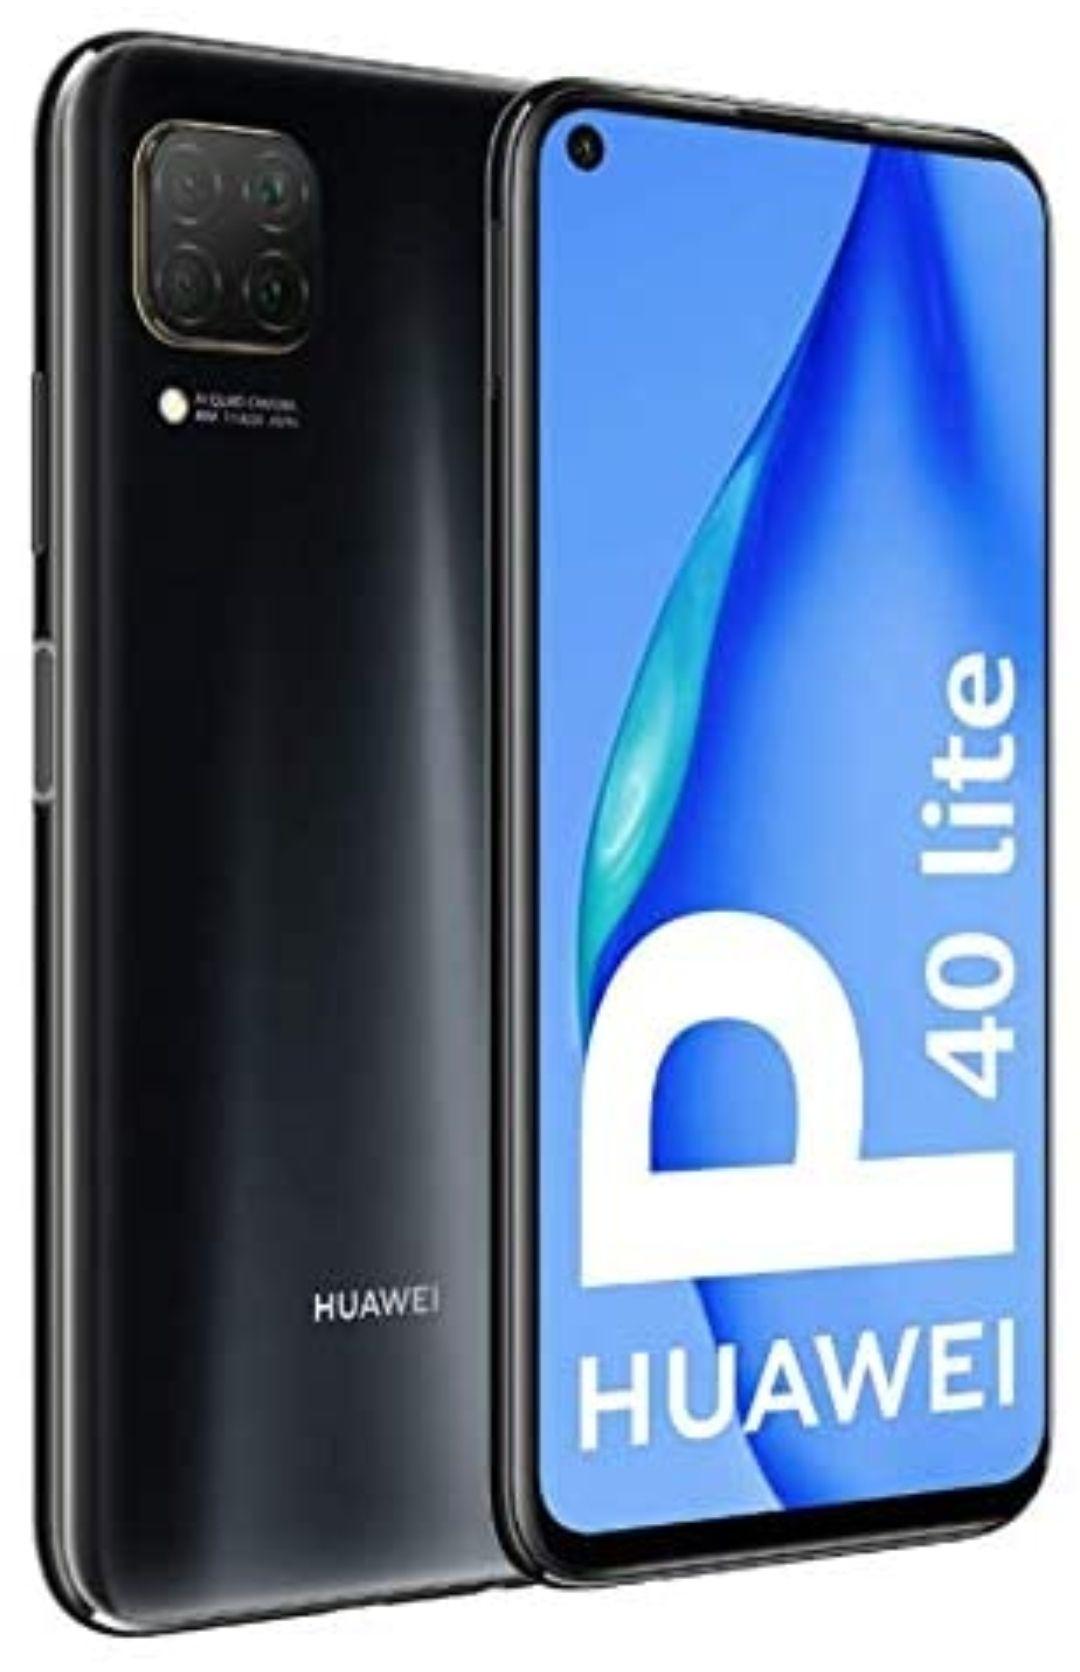 Huawei P40 Lite 5G Refurbished Like New Mobile Phone / Smartphone   4000mAh Kirin 810 - £159 + £10 Top Up @ Giffgaff